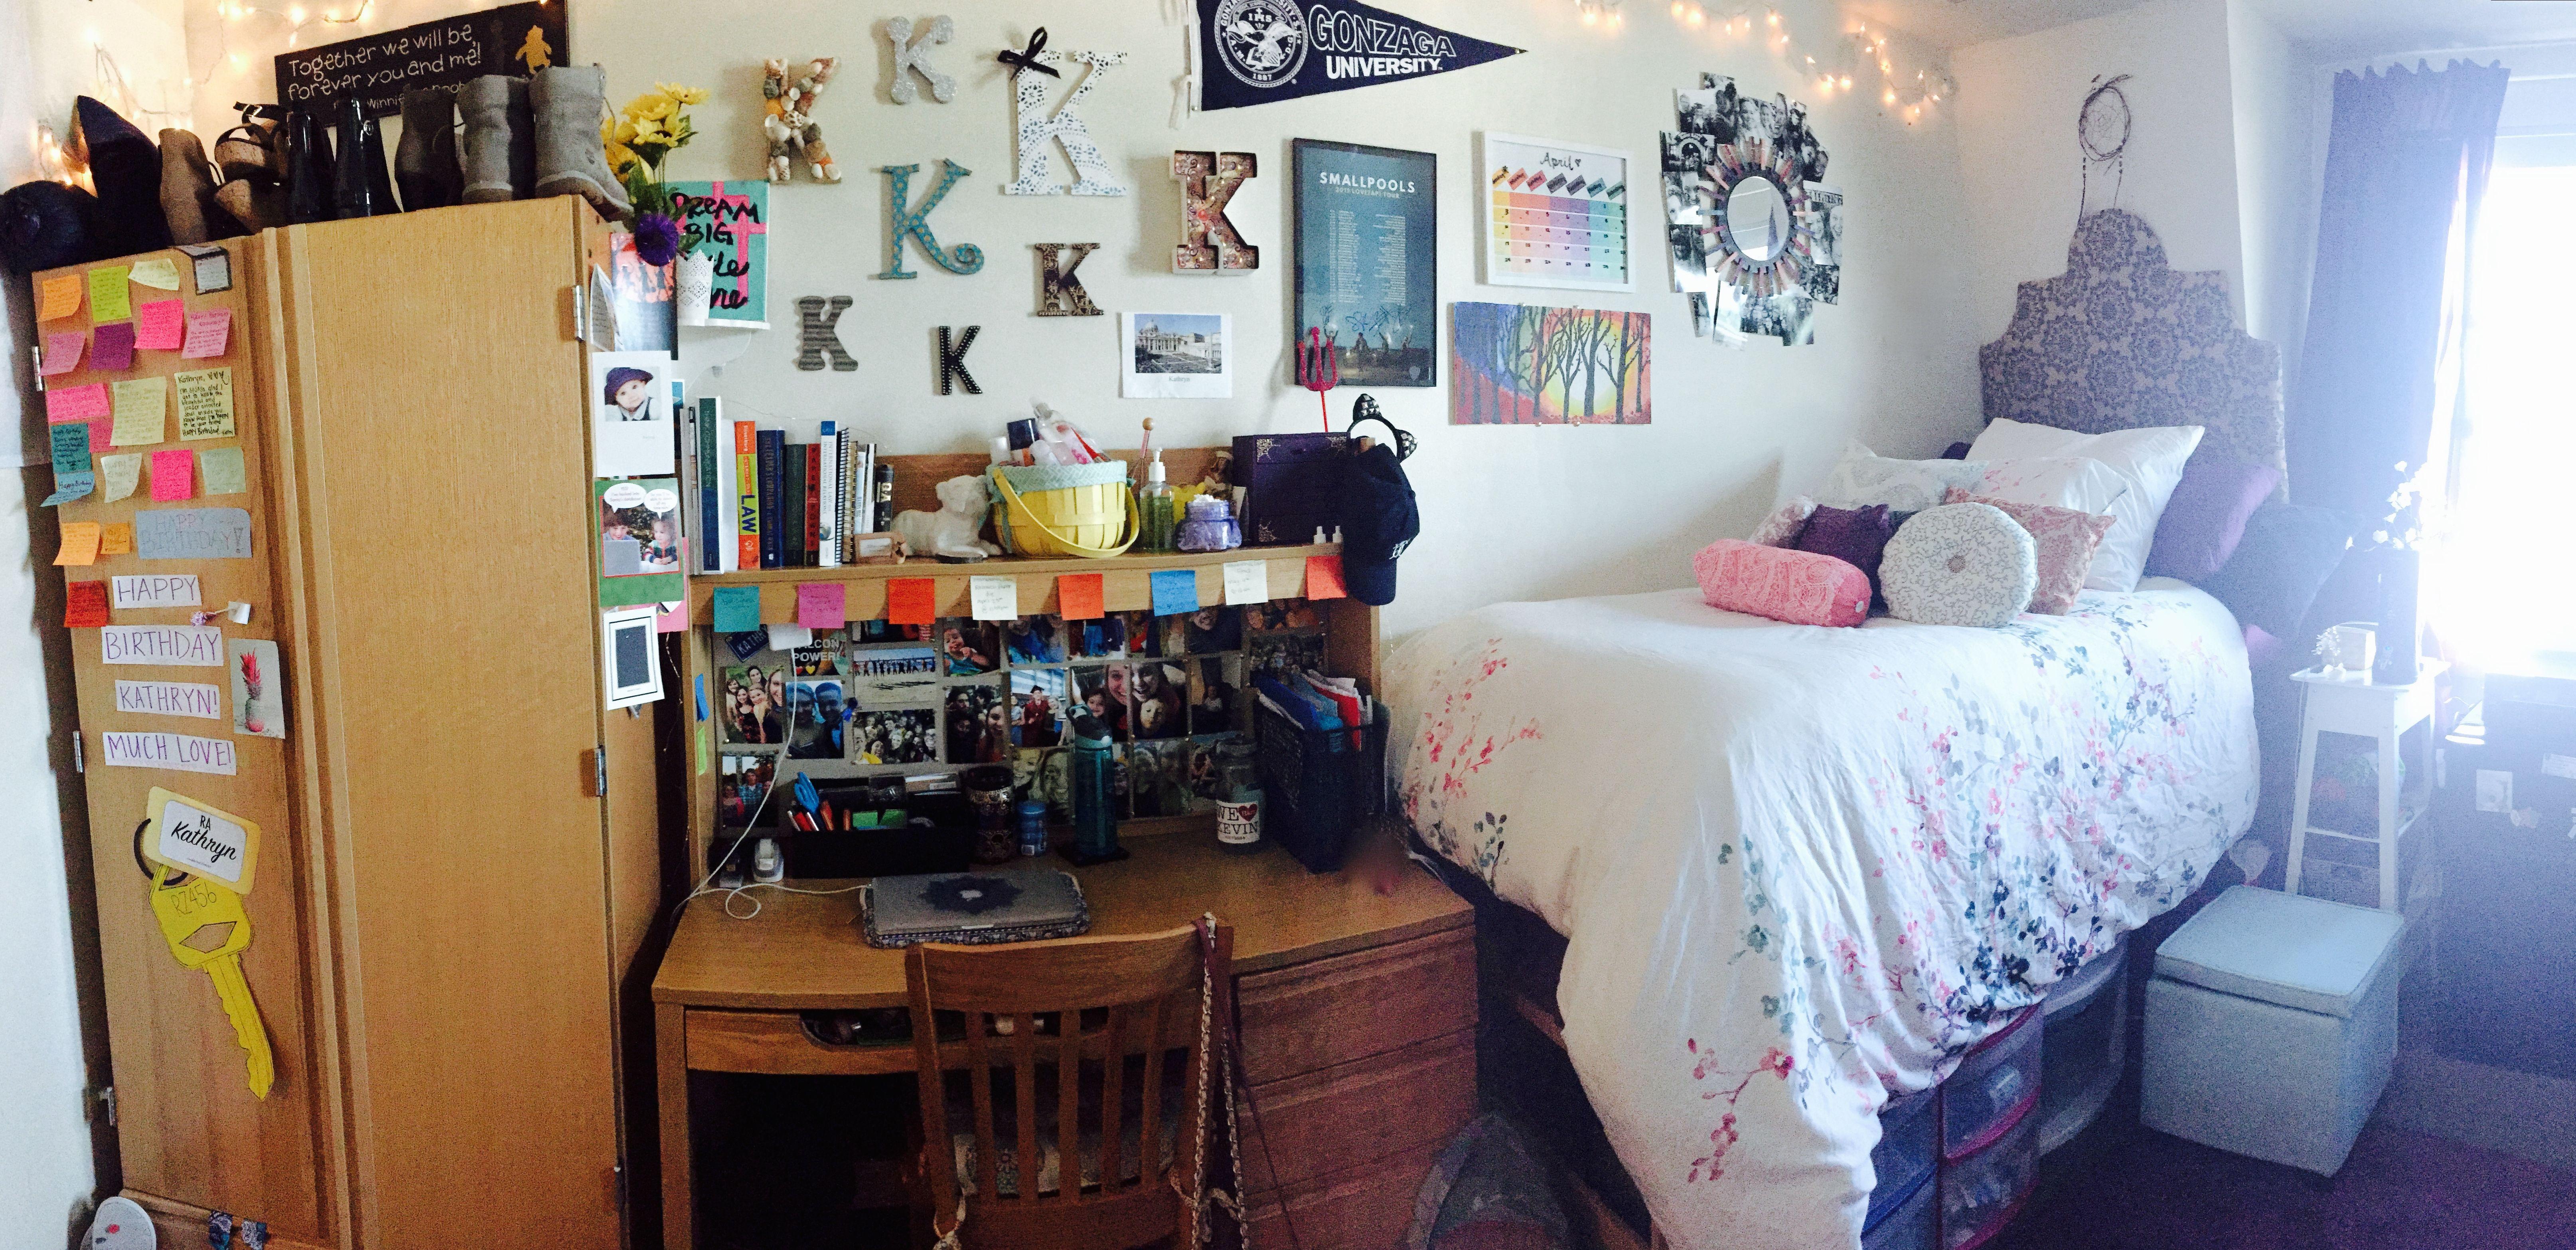 My freshman dorm room at Gonzaga University    Dorm Room